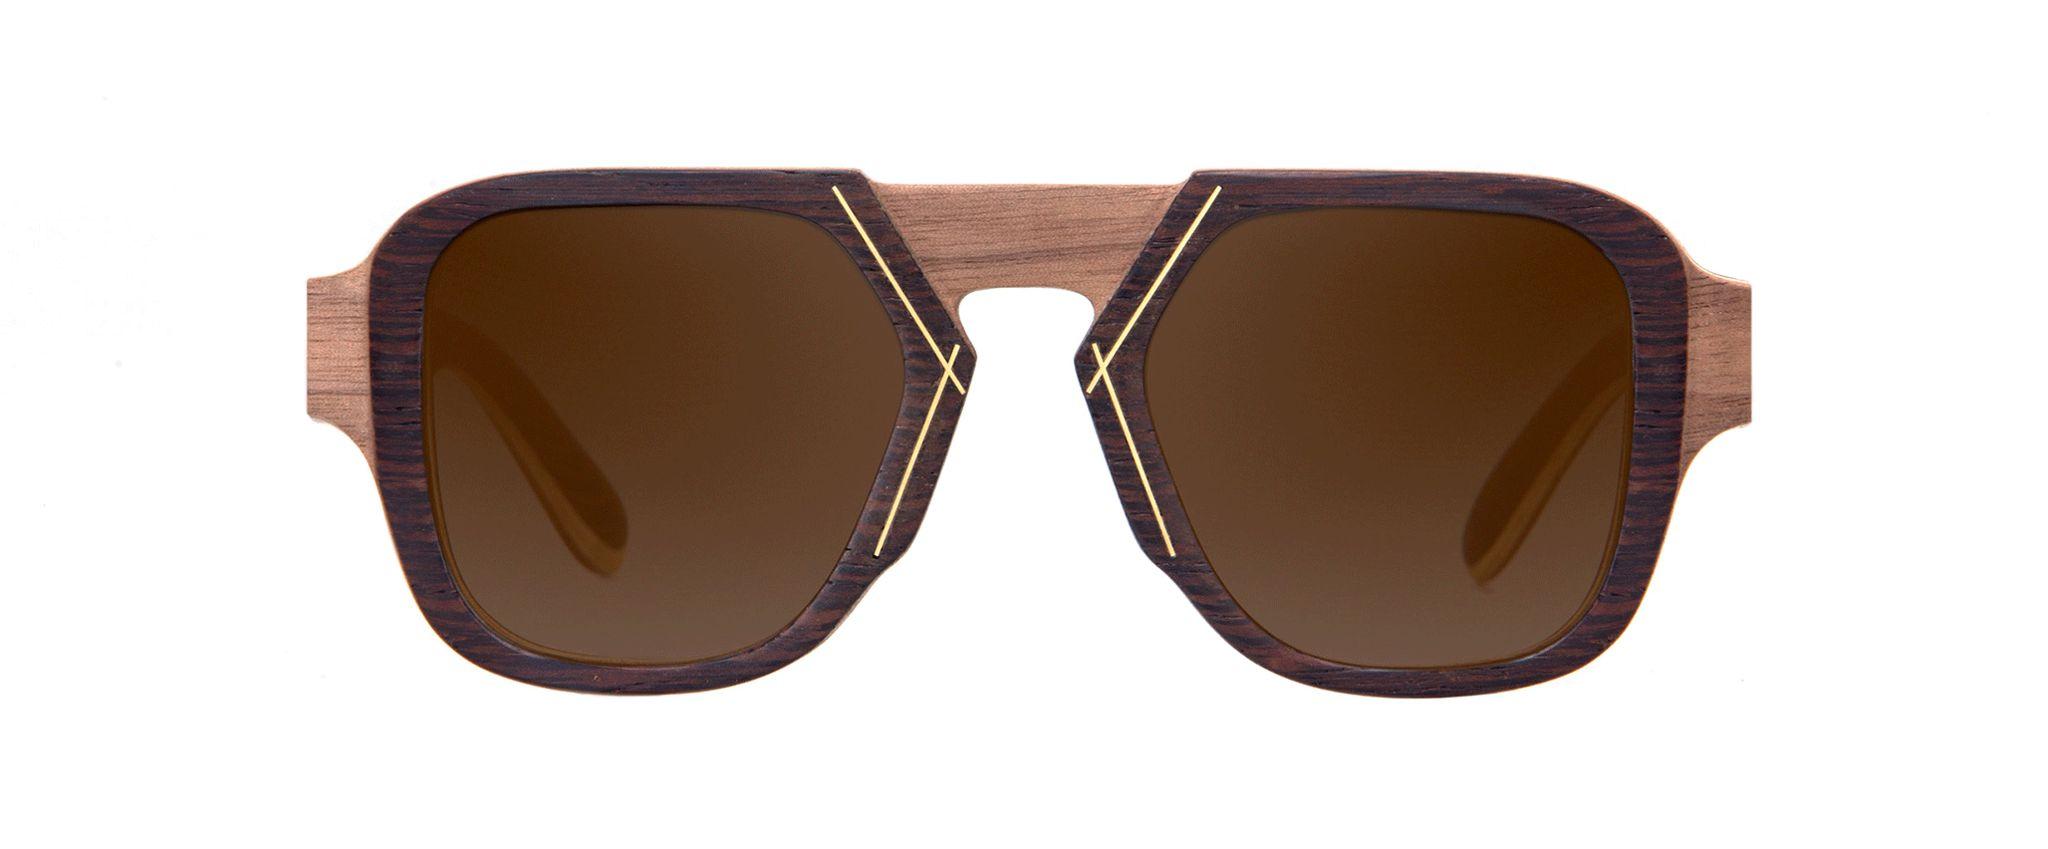 Voodoo walnut Vakay designer sunglasses